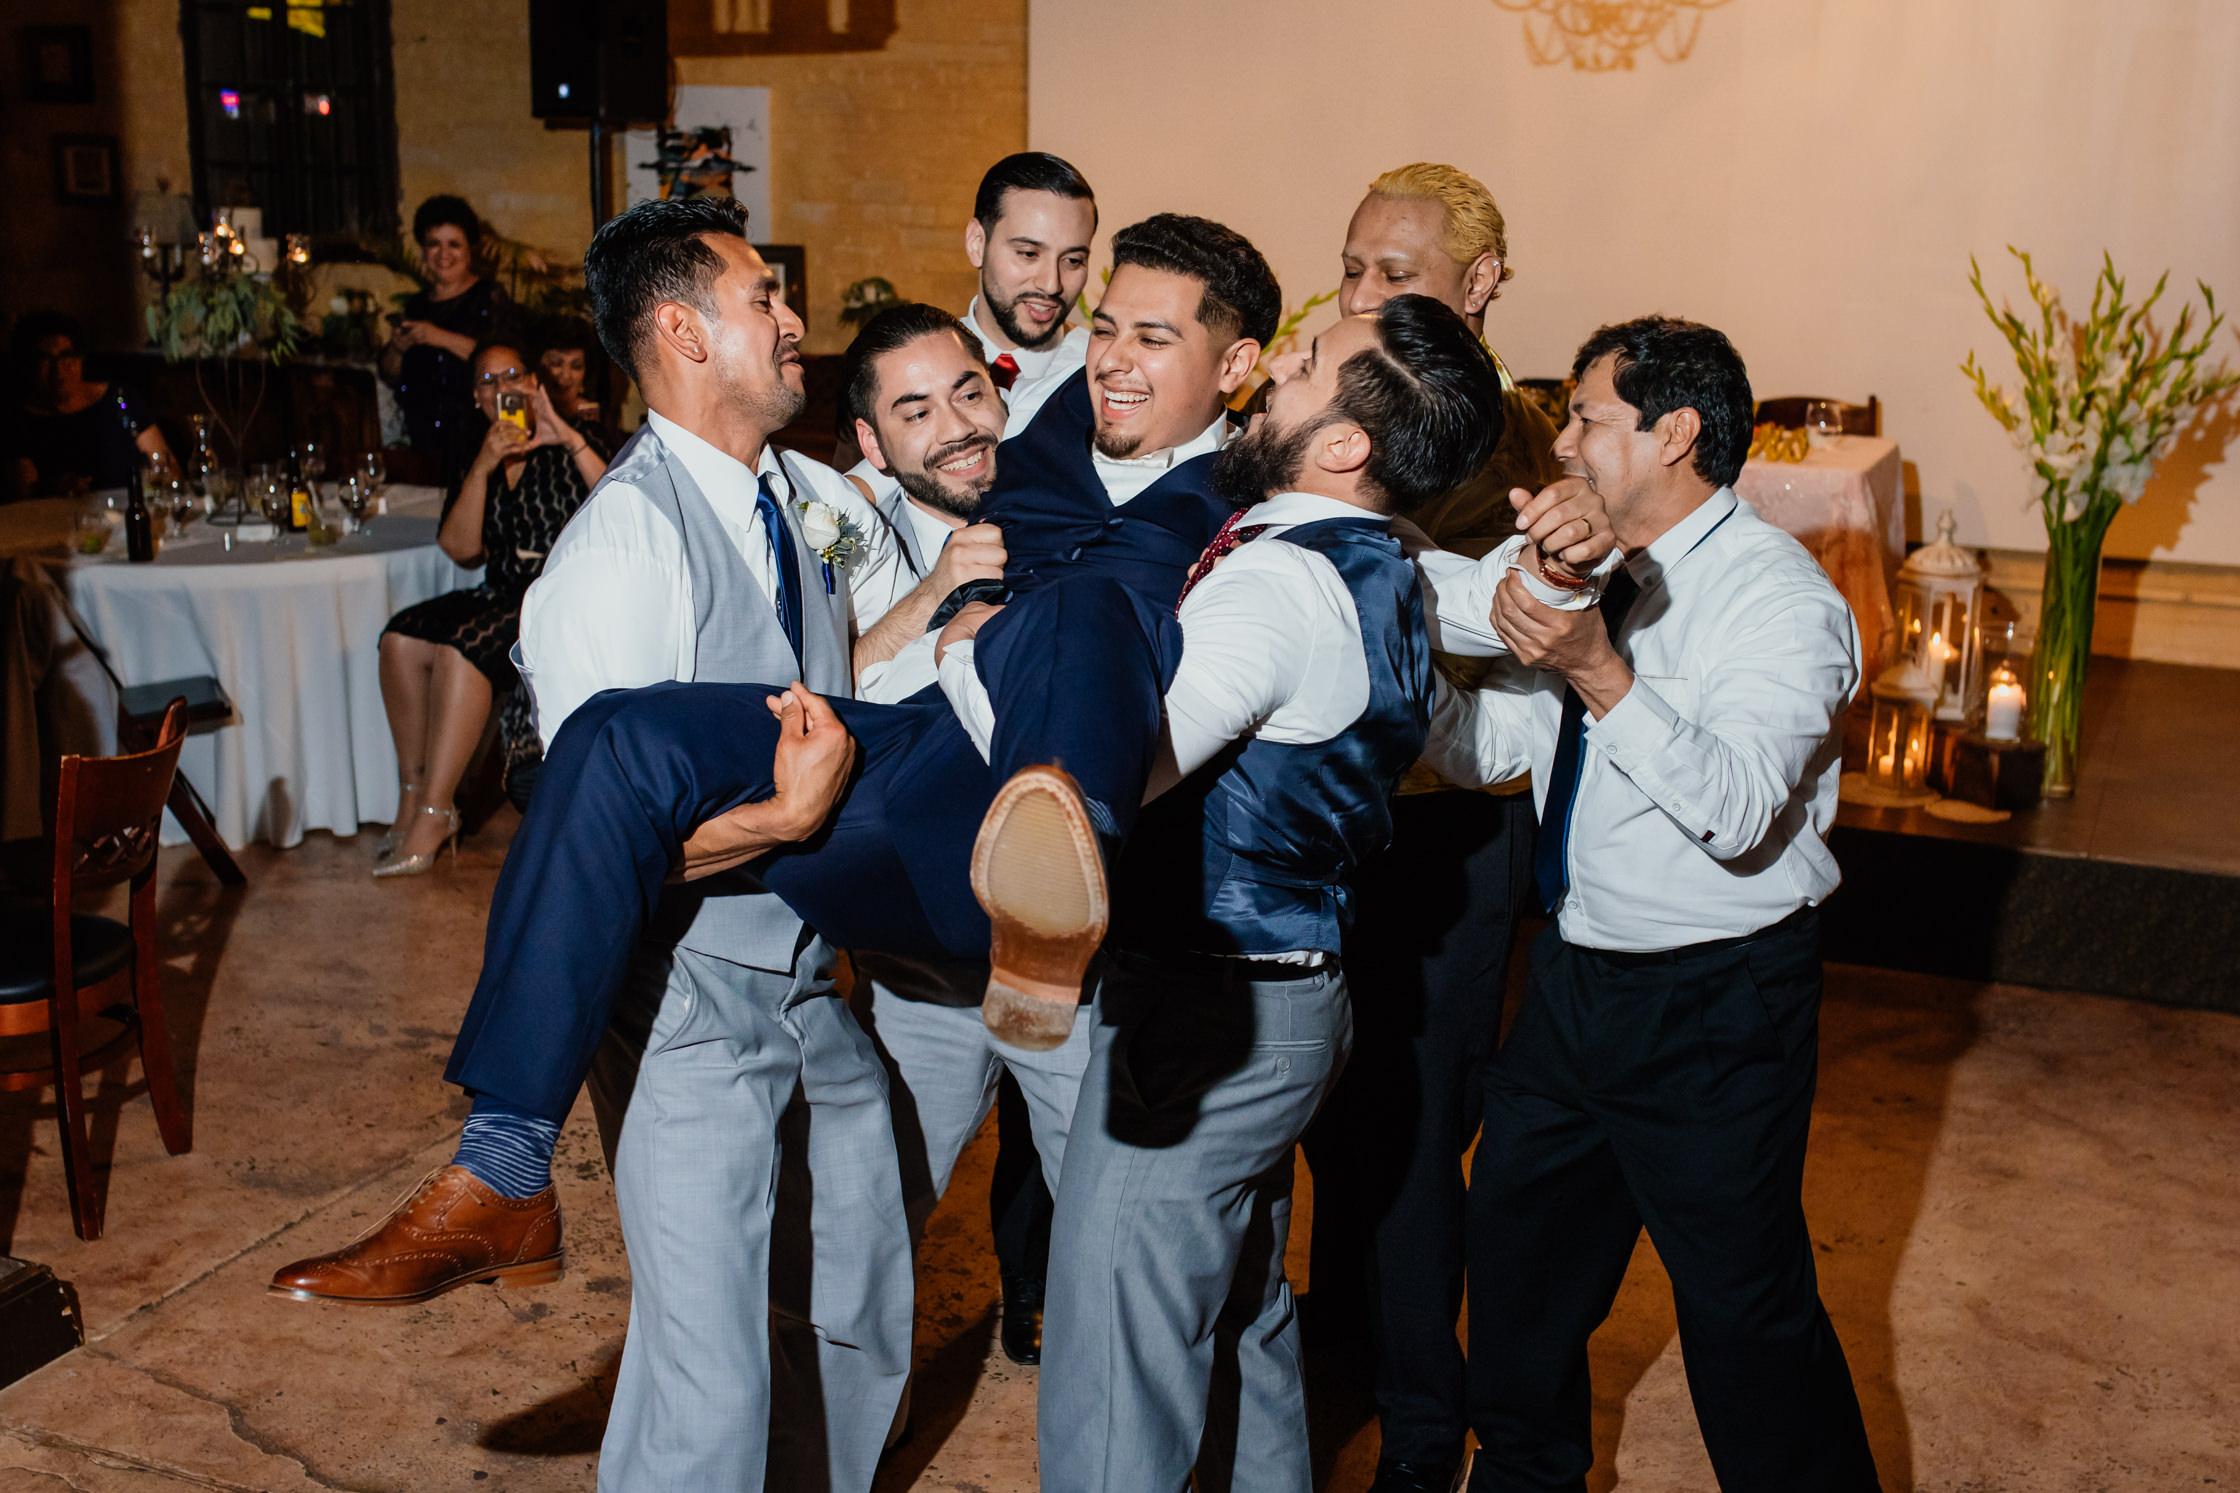 luis_joanna_wedding-99.jpg